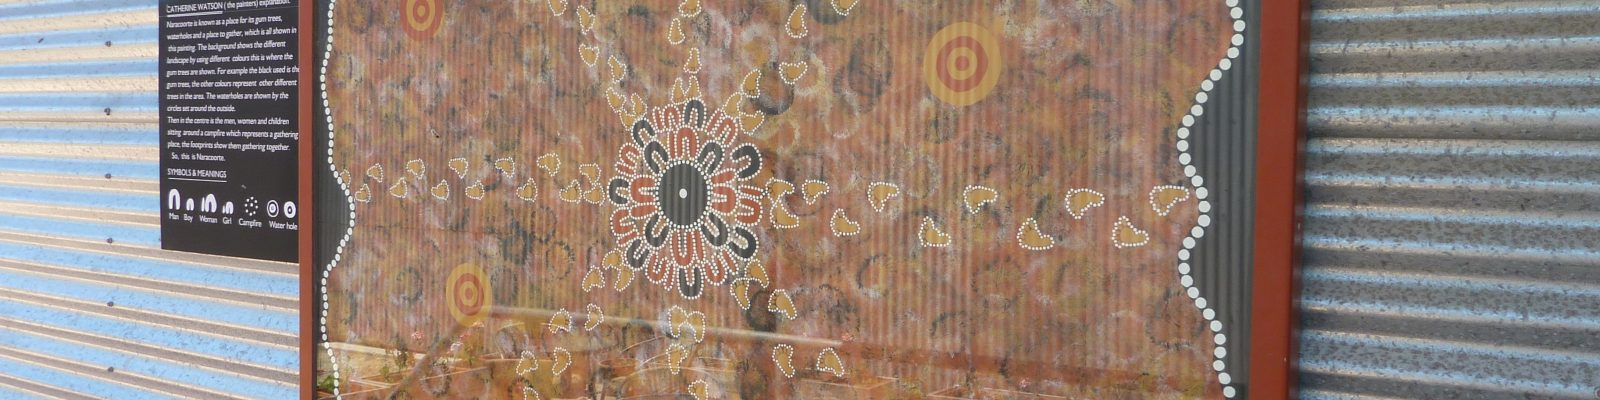 Image of Aboriginal Artwork